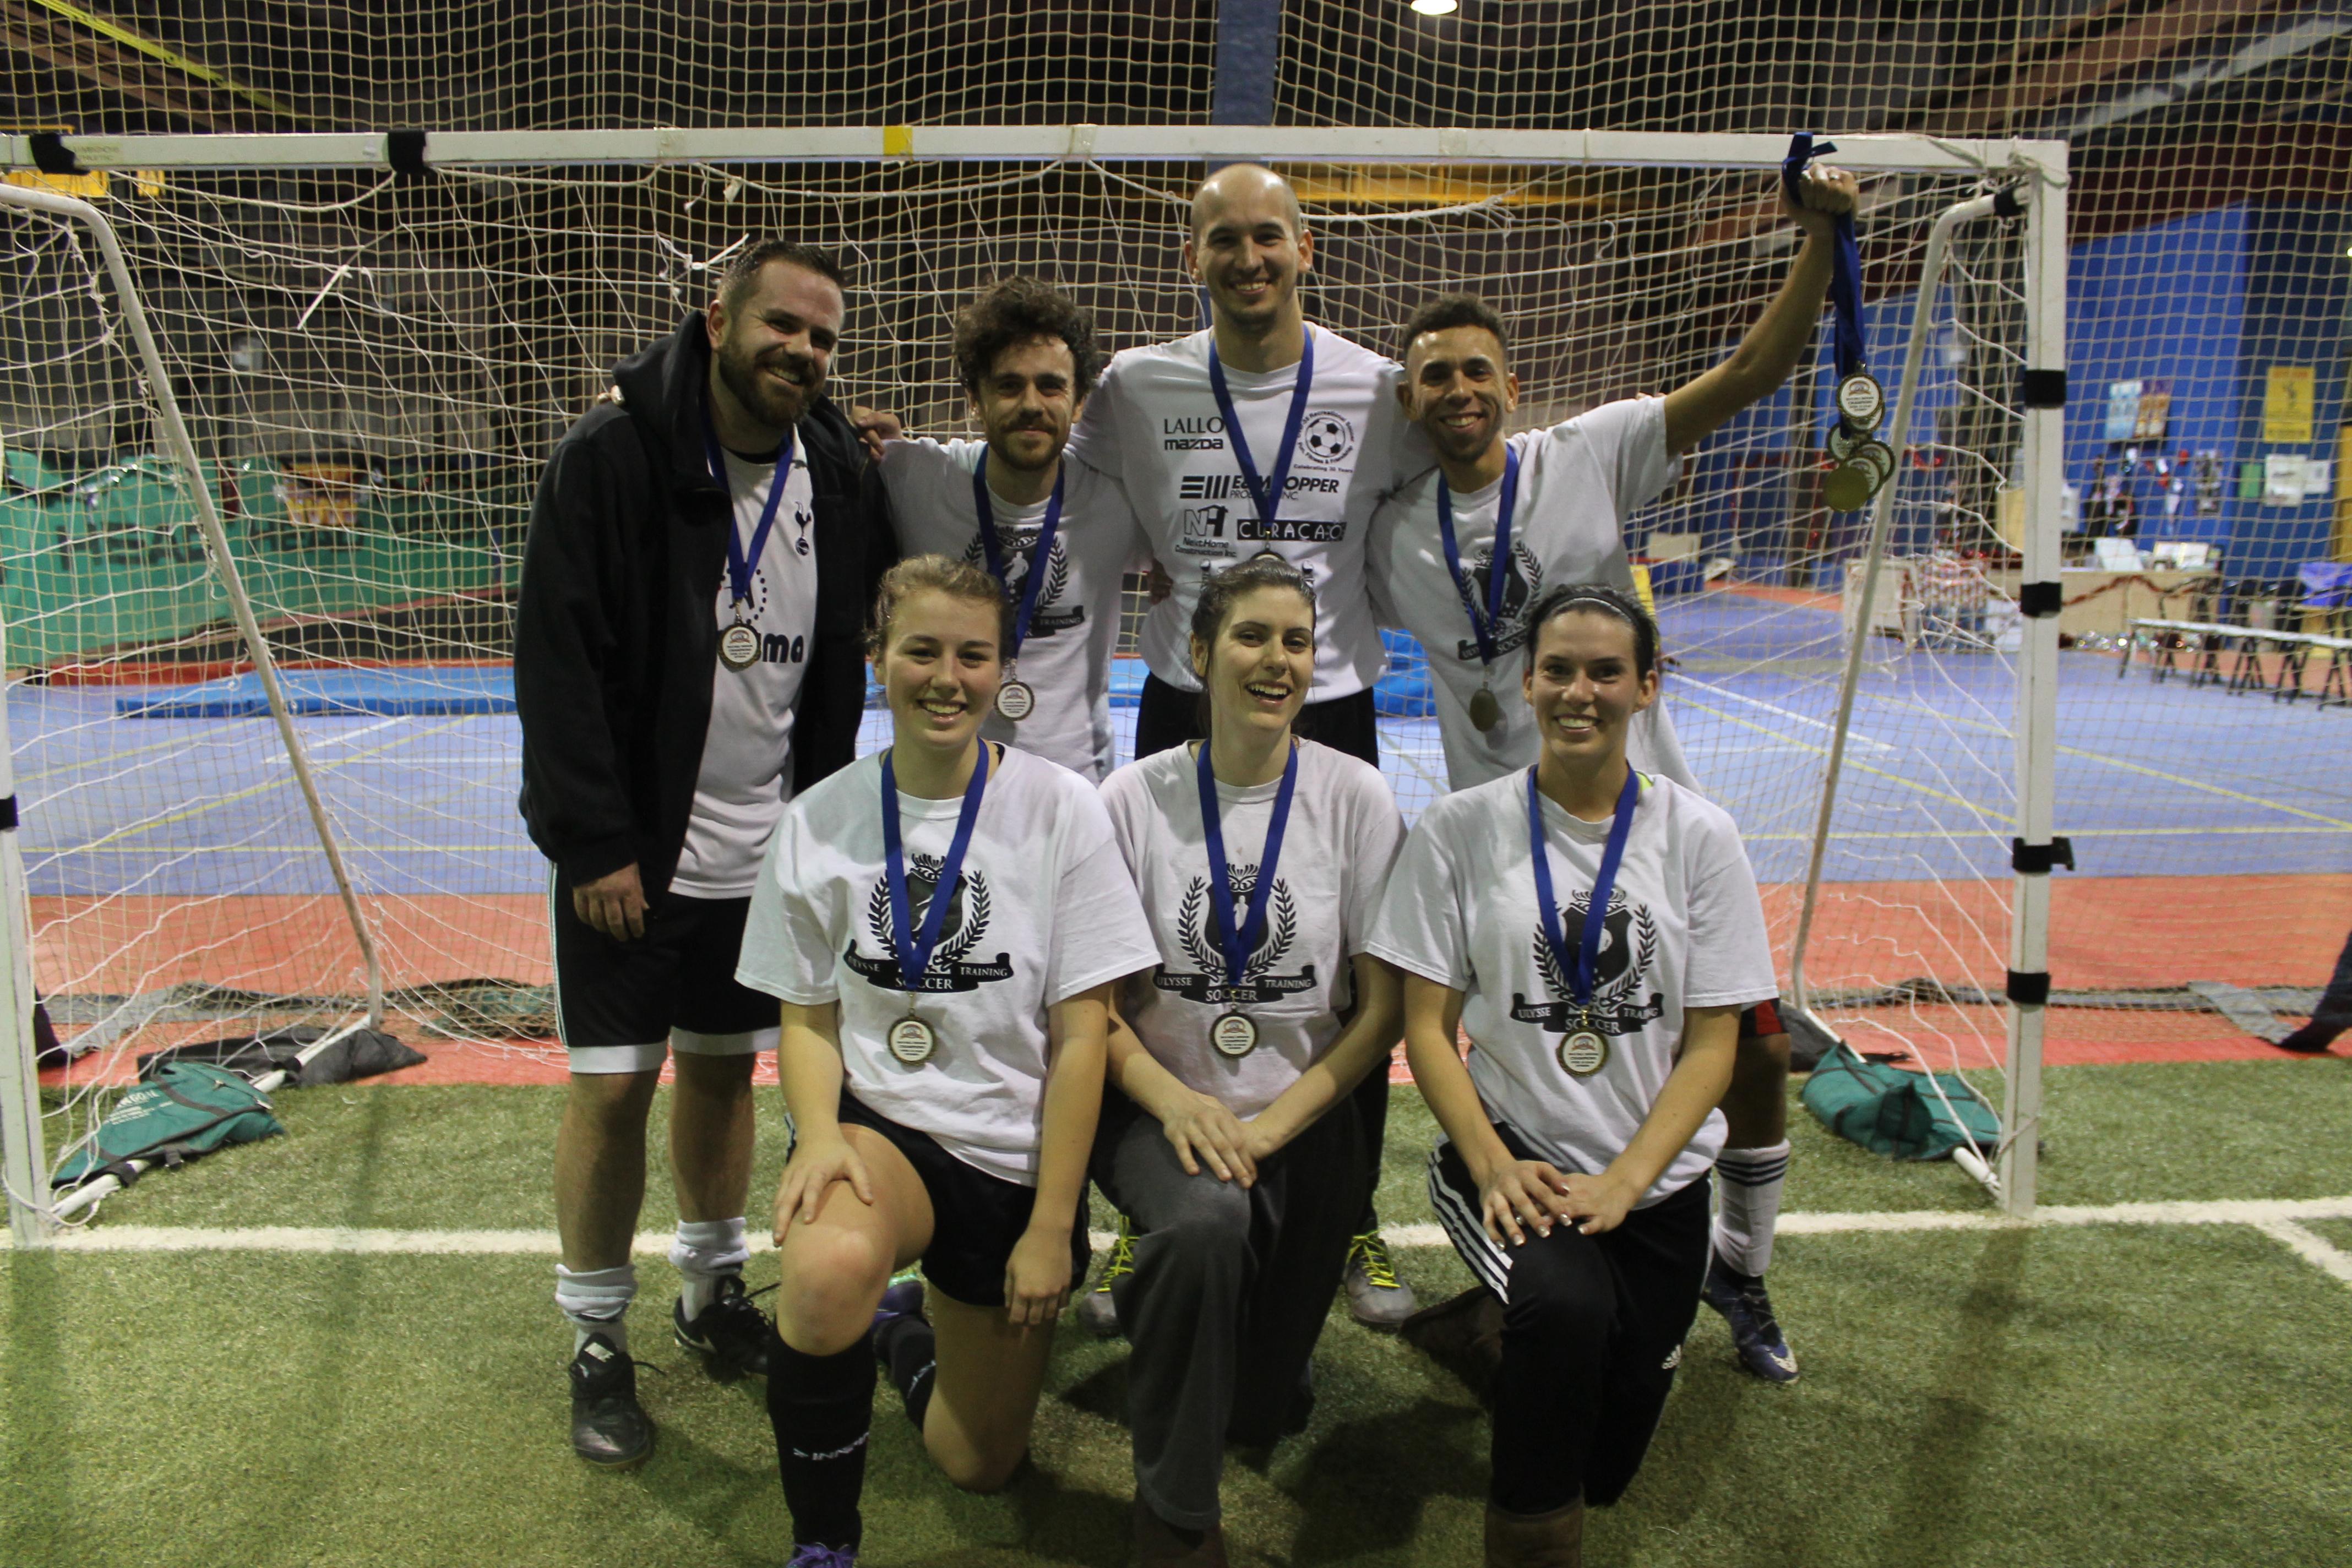 Fall Indoor Champions Brantford City Soccer Club